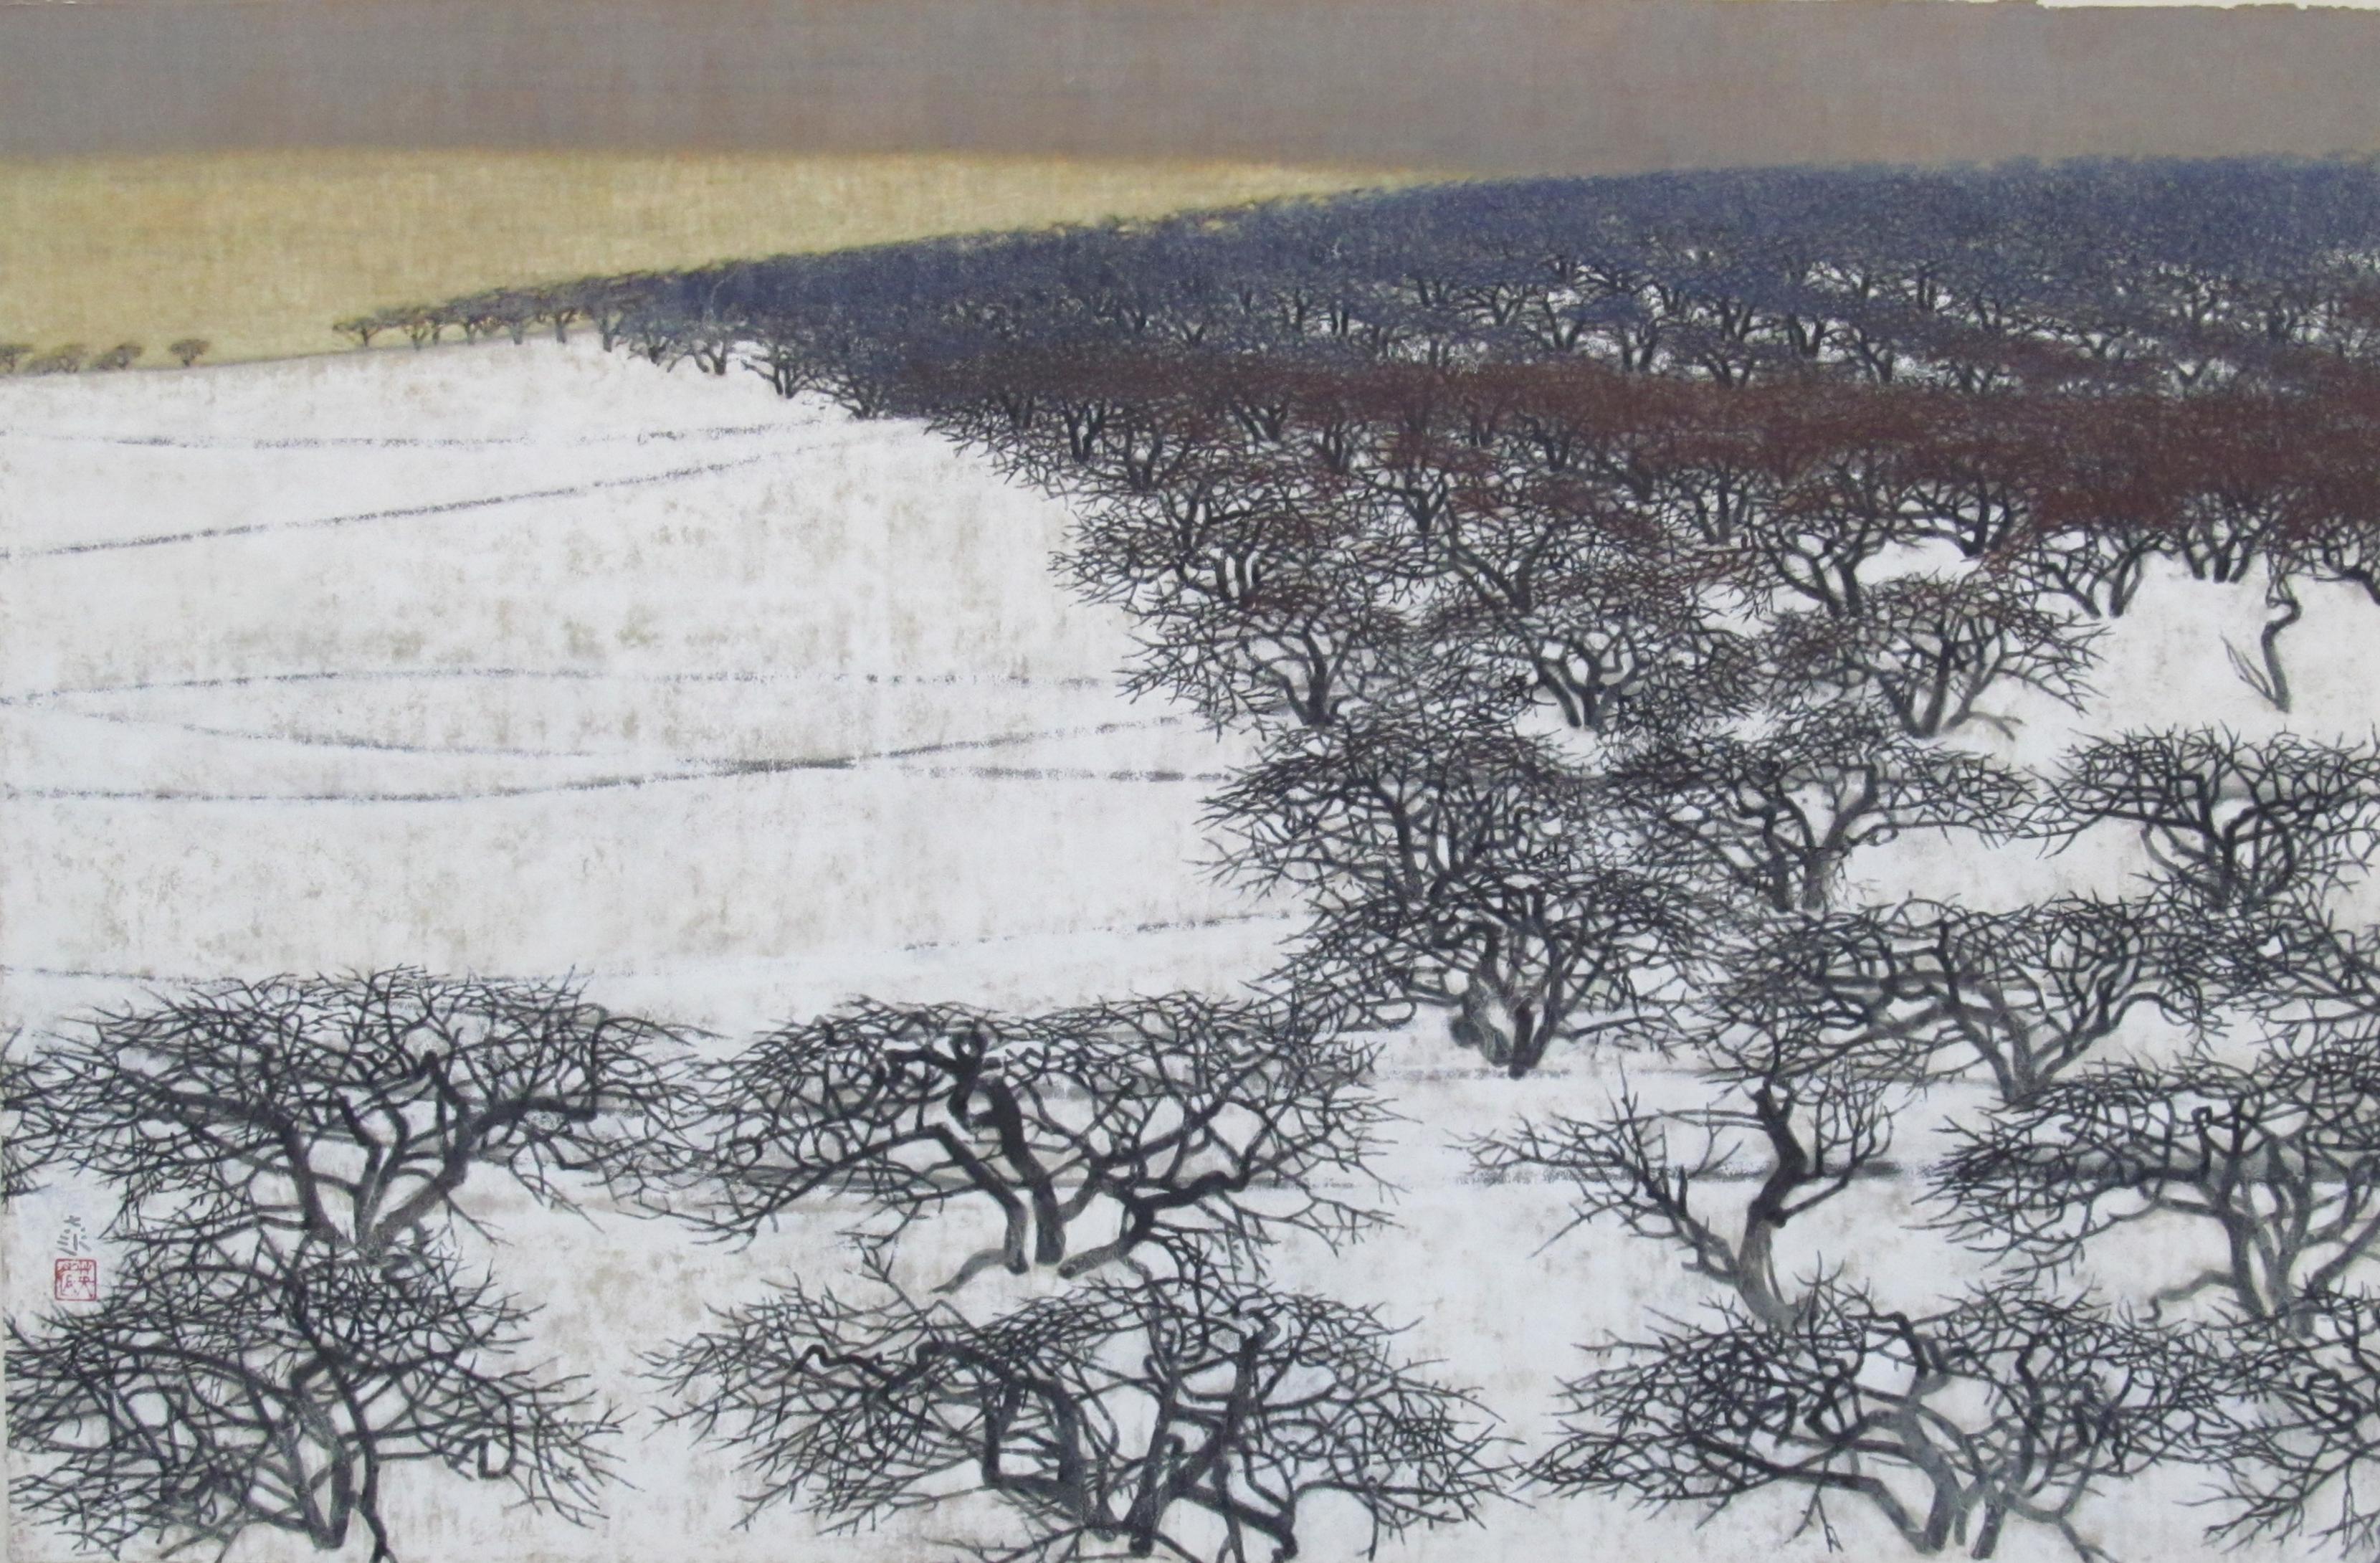 岩橋英遠 Iwahashi Eien | 西邑画廊 Yaesu Nishimura Gallery